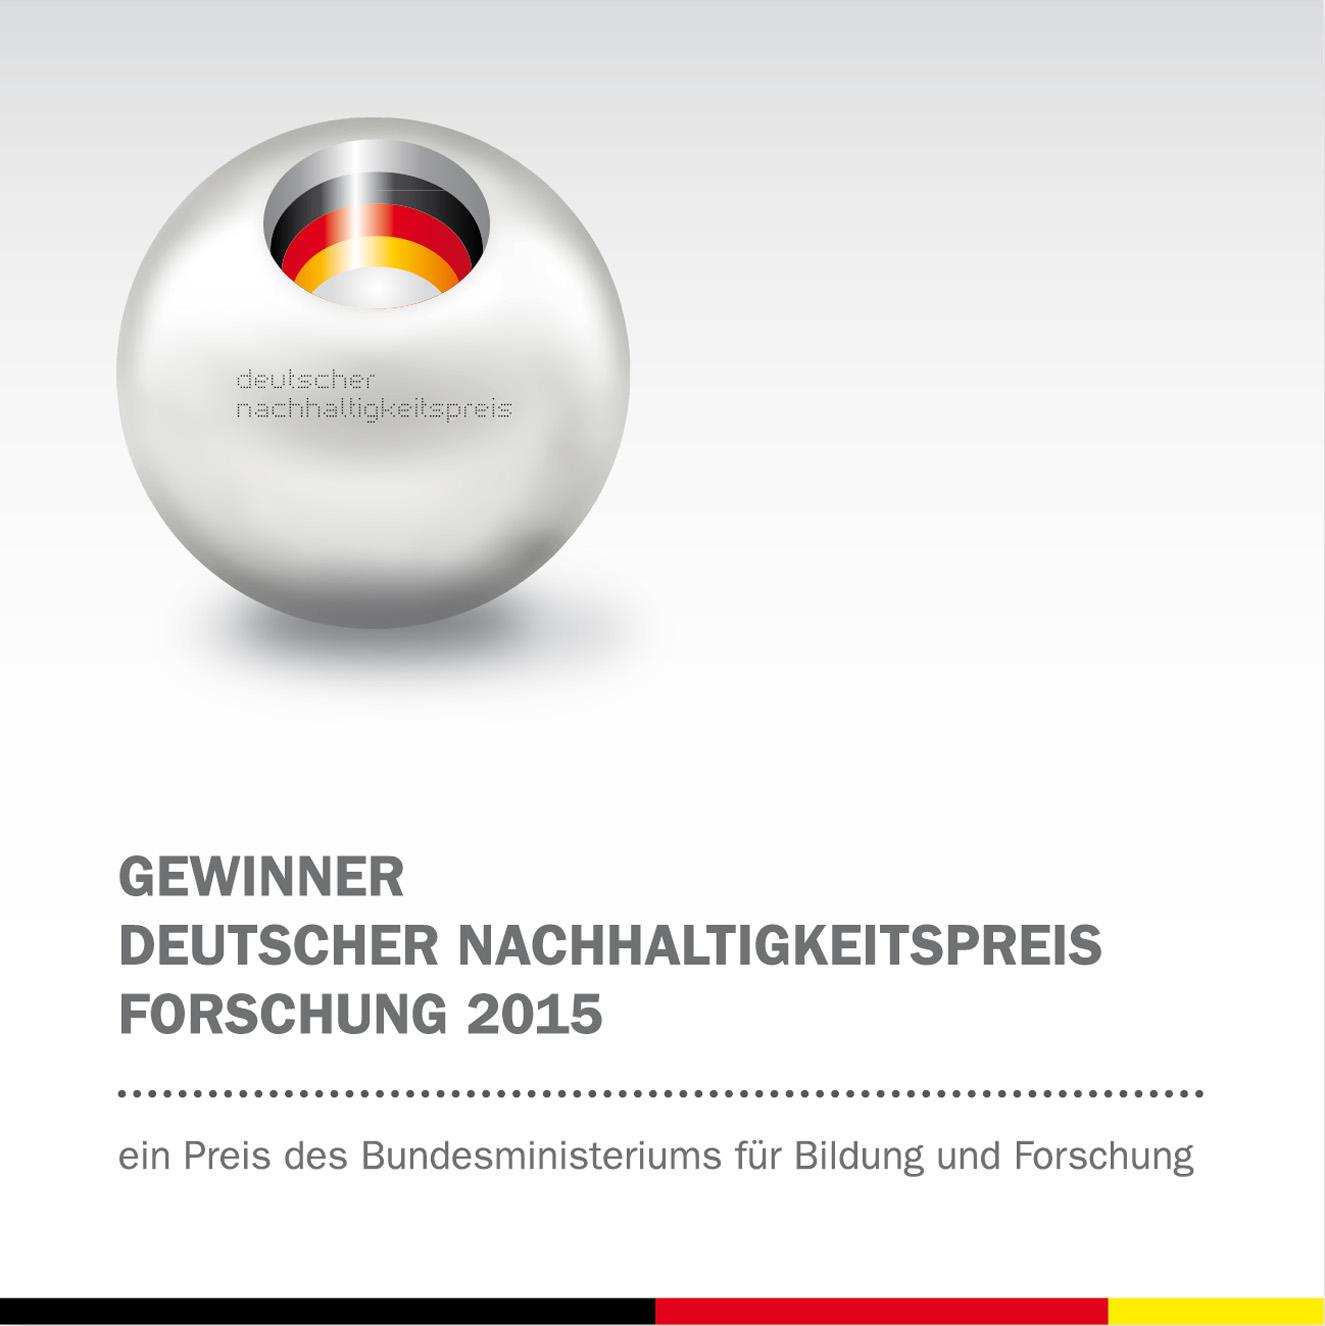 siegel_gewinner_forschungspreis_2015 Kopie